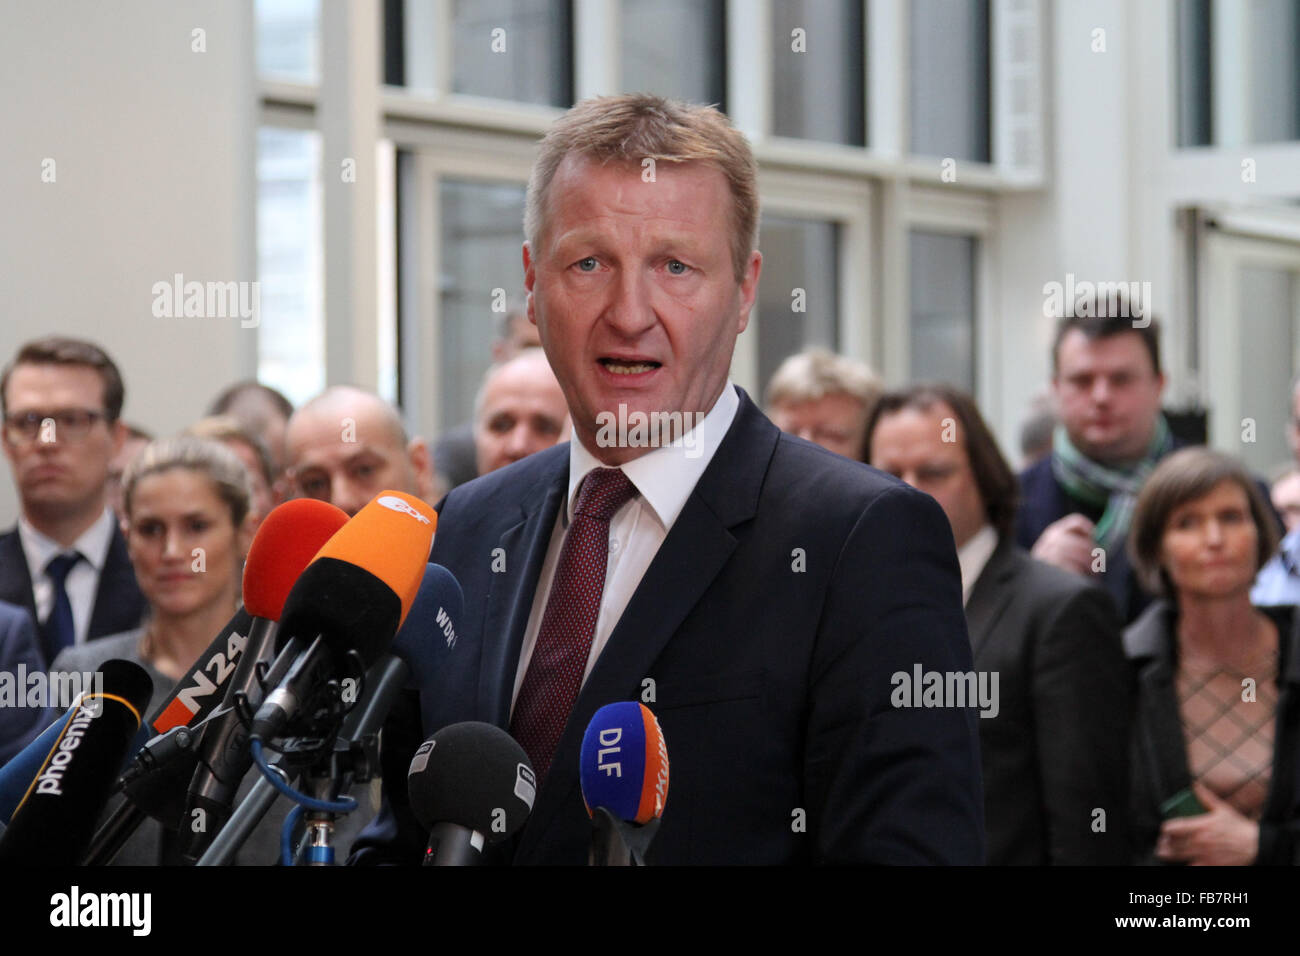 Dusseldorf, Germany. 11th Jan, 2016. Ralf Jaeger, Interior Minister of the German state of North Rhine-Westphalia, - Stock Image